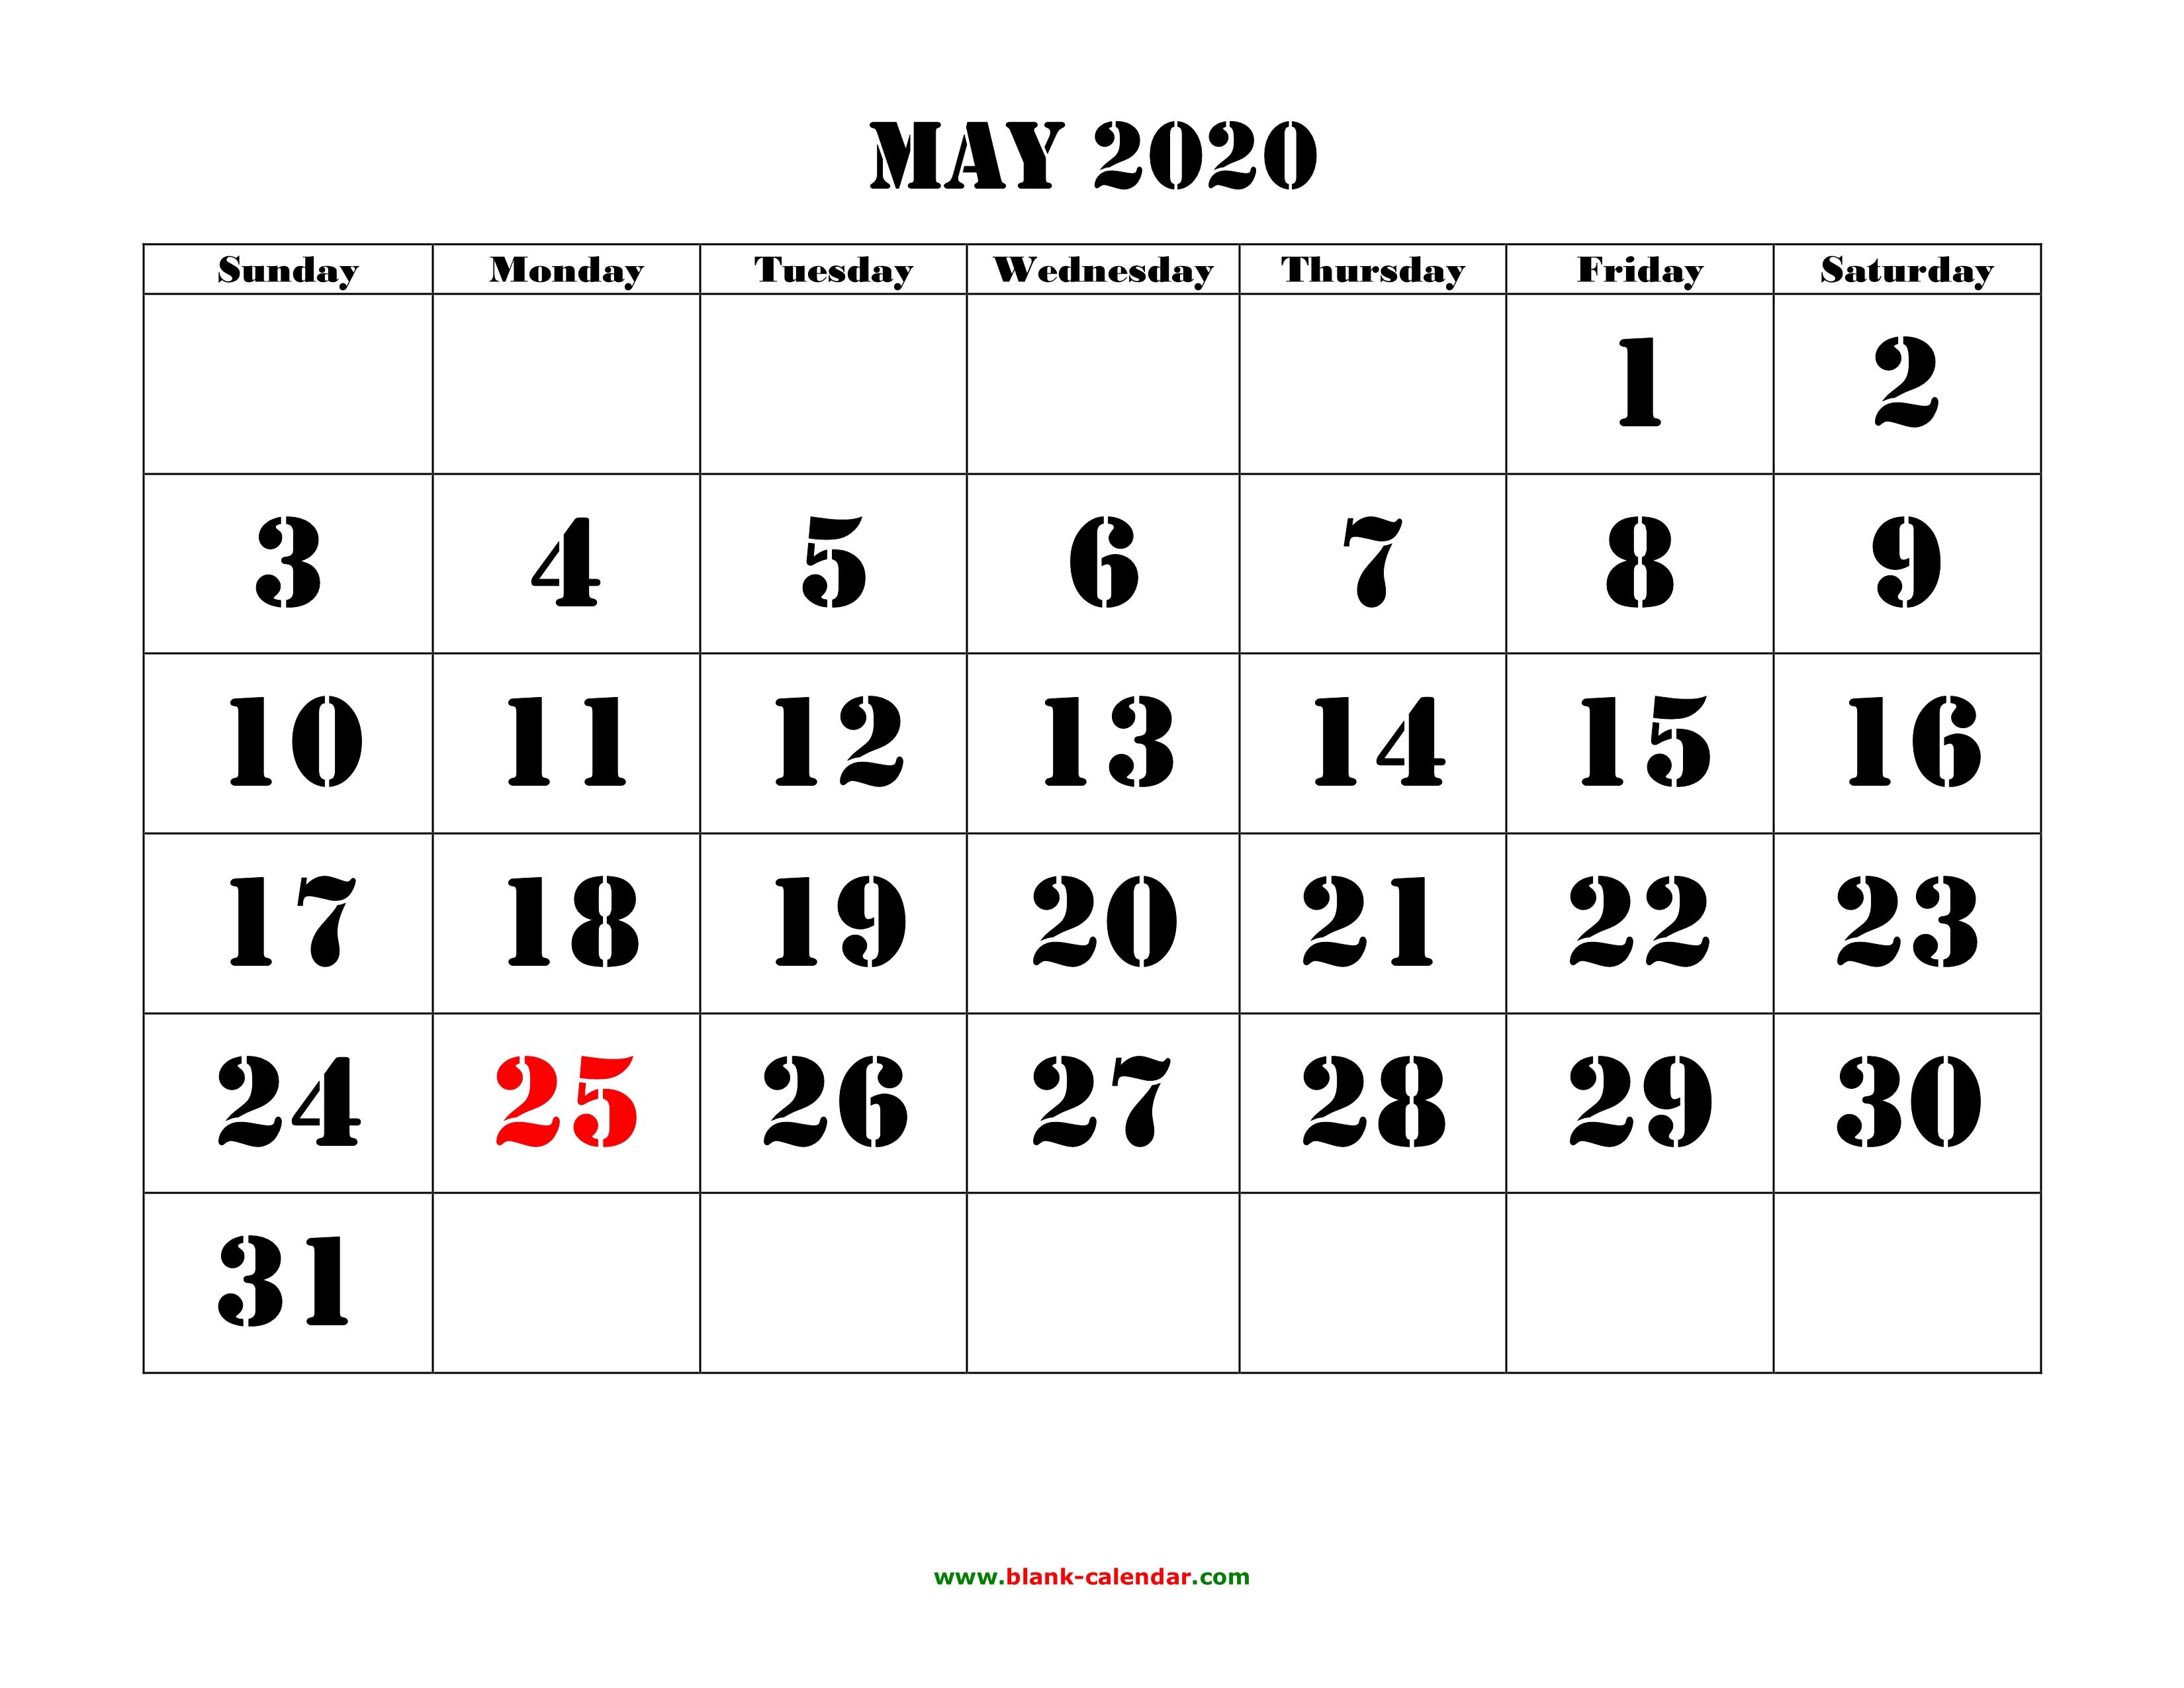 Free Download Printable May 2020 Calendar, Large Font Design